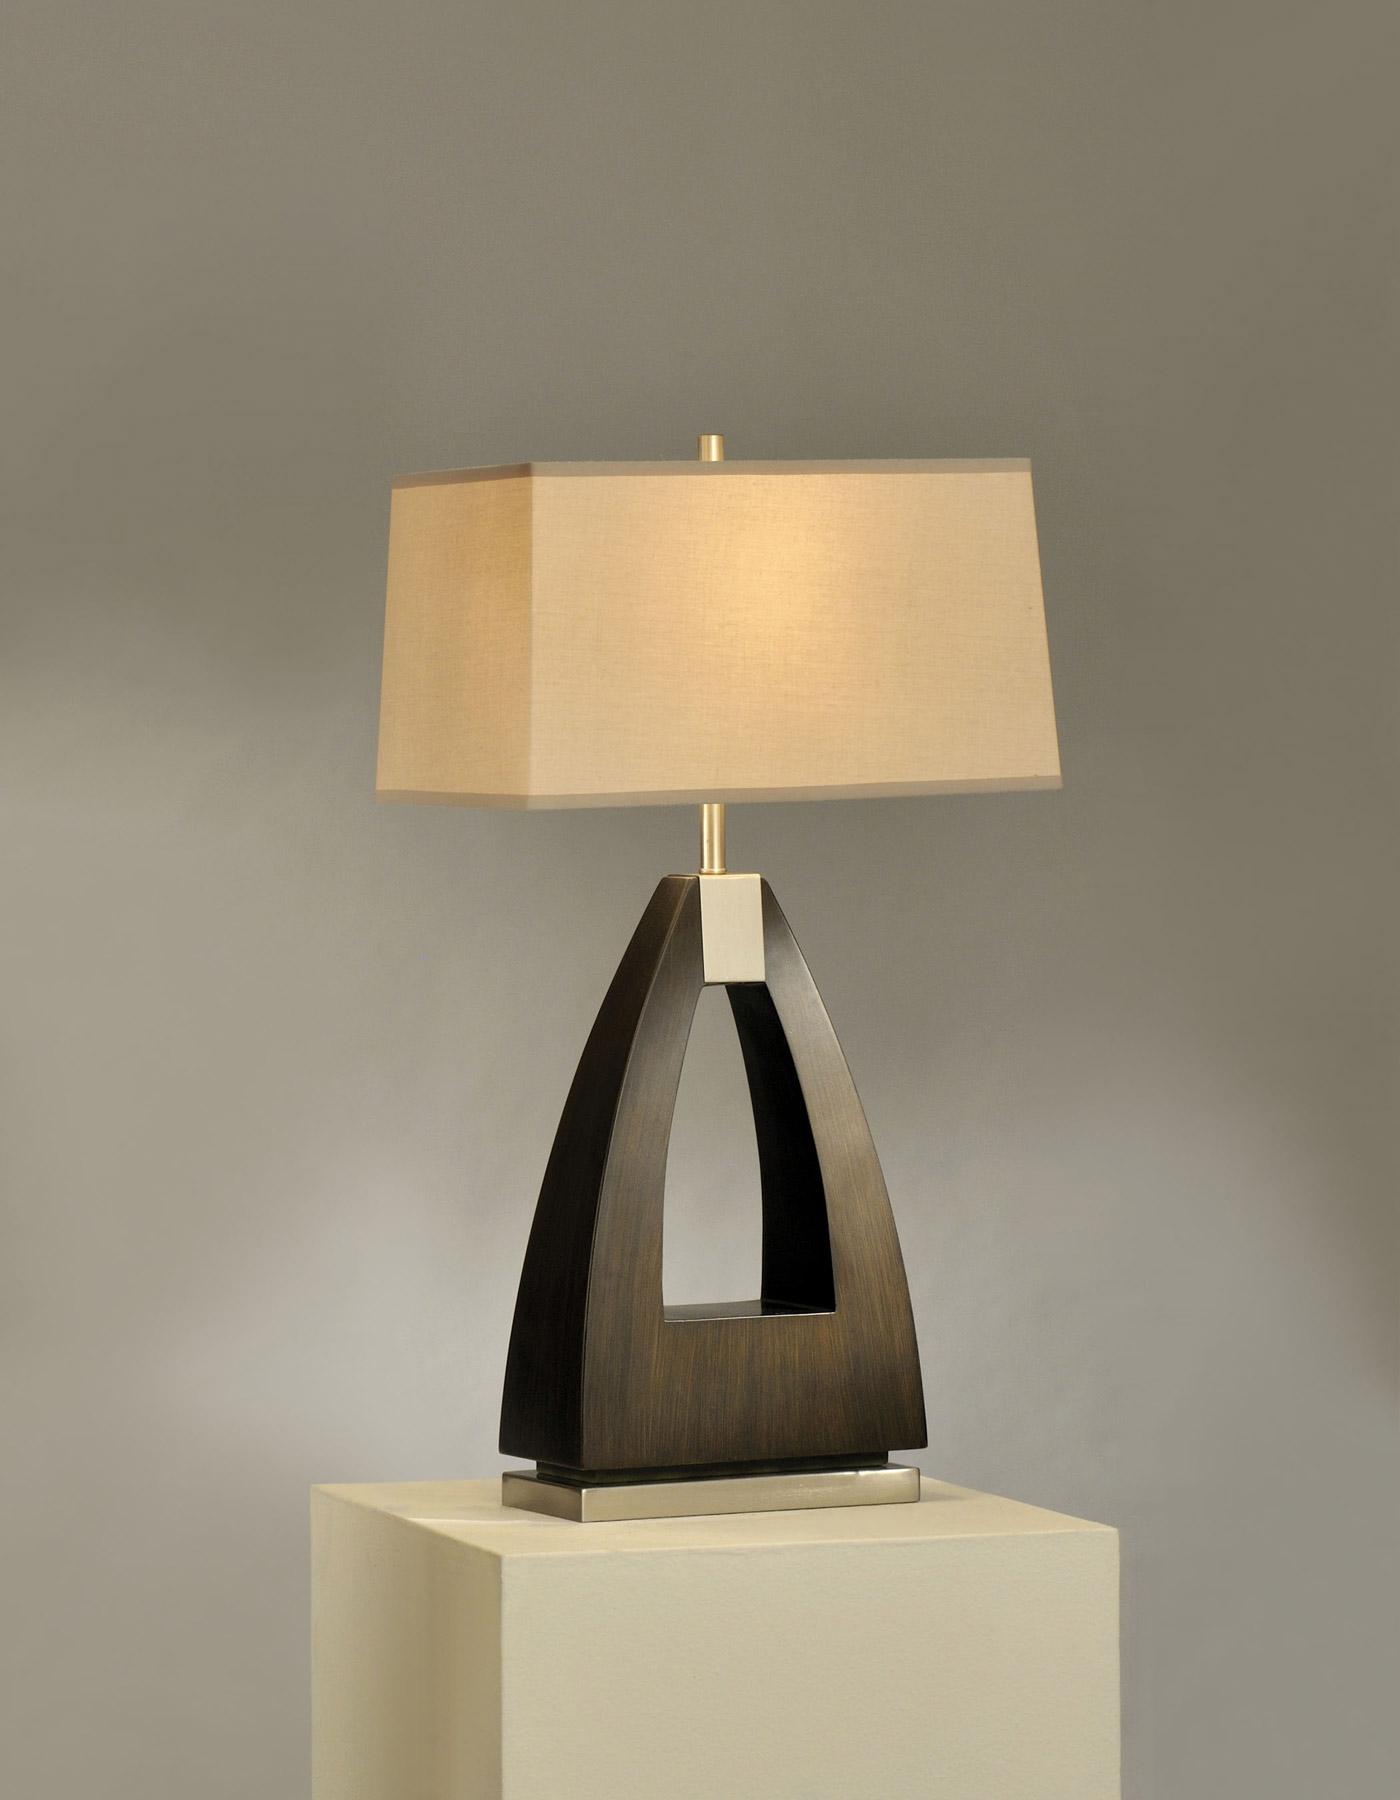 Nova Lighting 10392 Trina Table Lamp